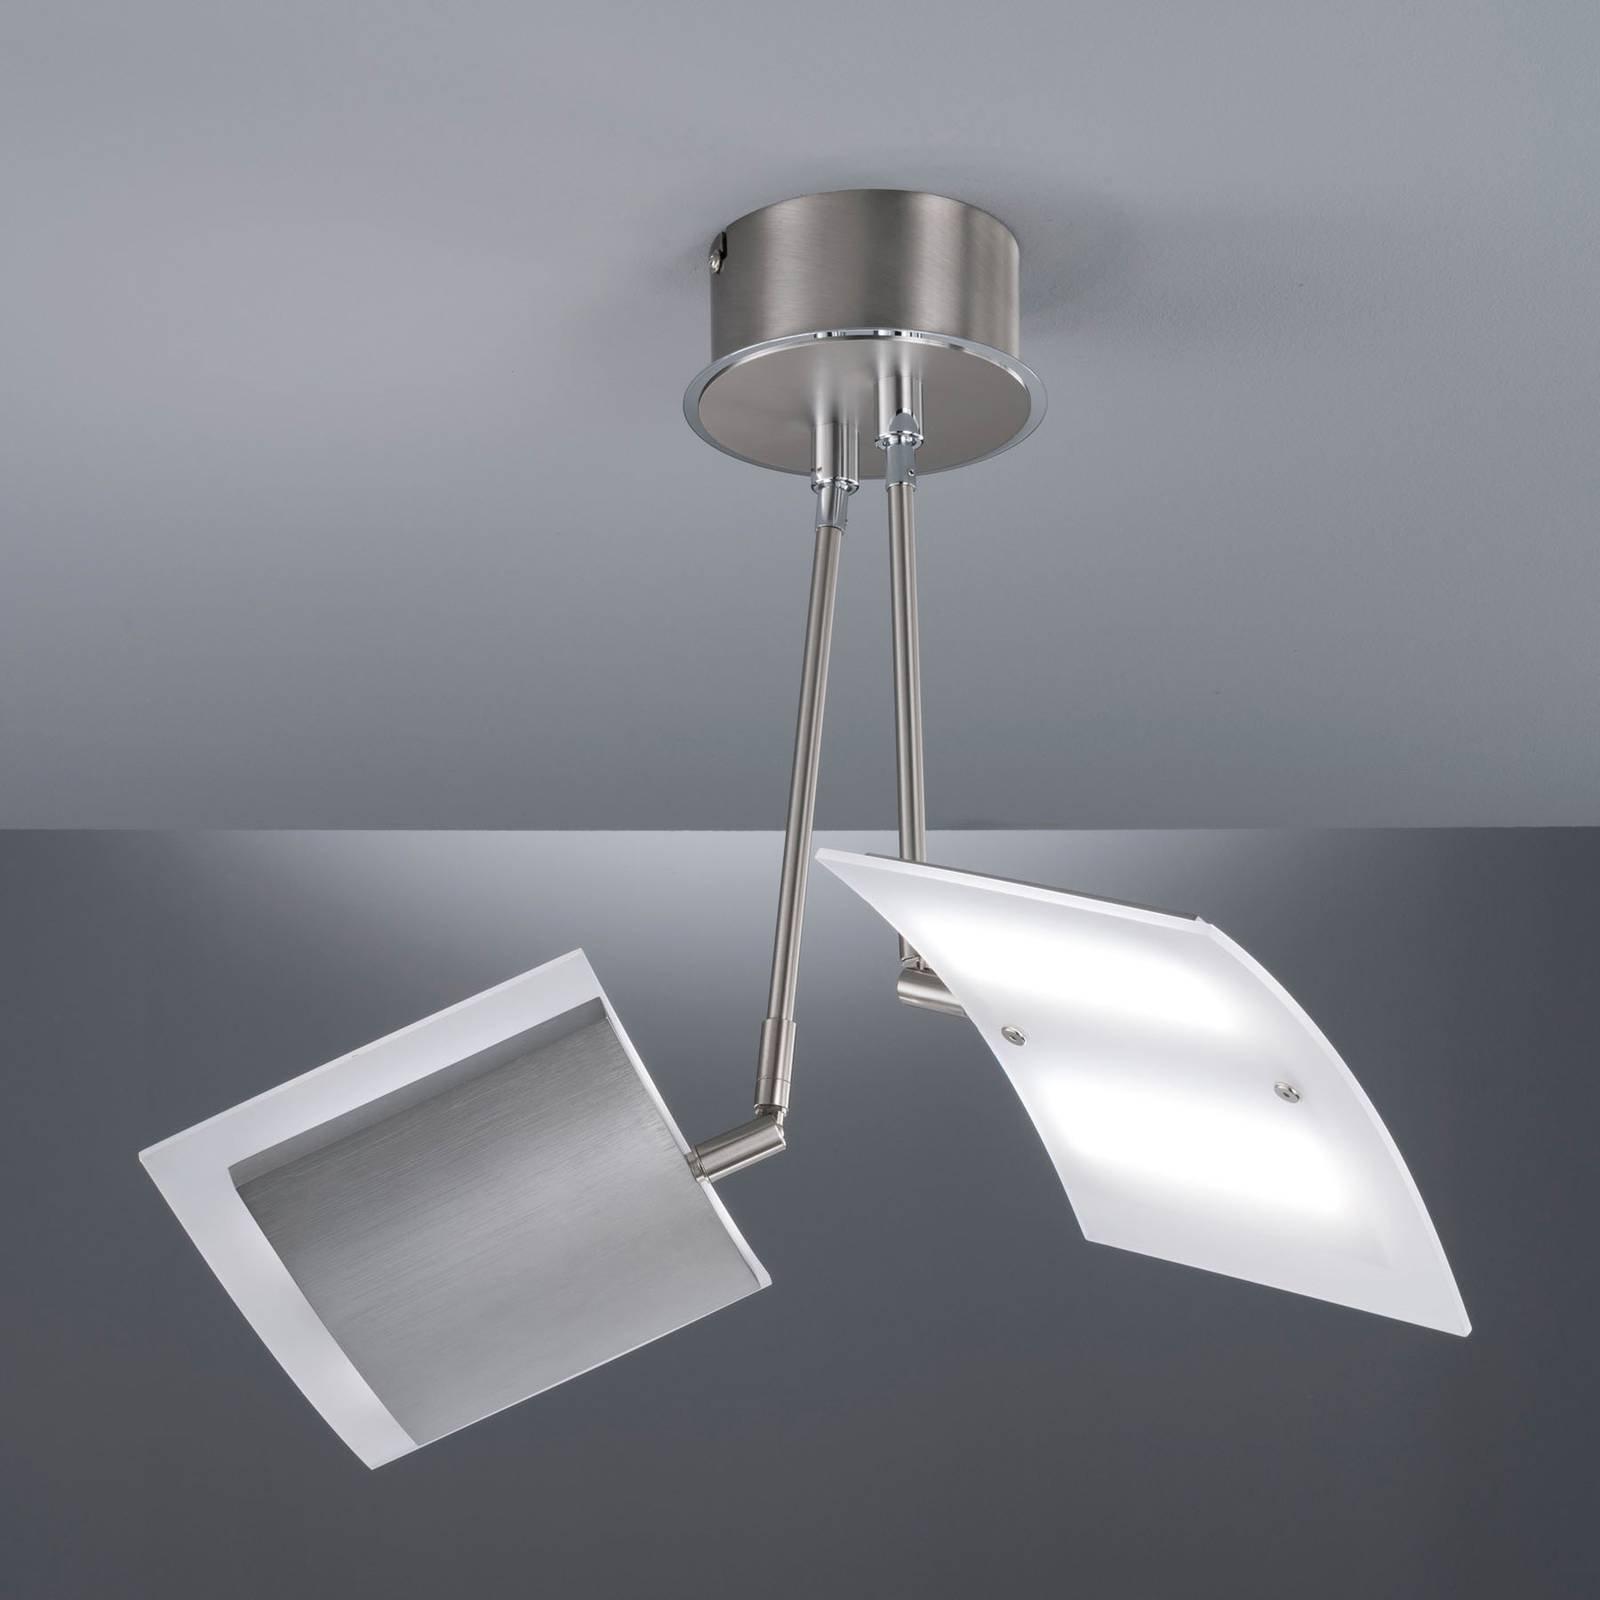 LED-taklampe Tours, med fjernkontroll